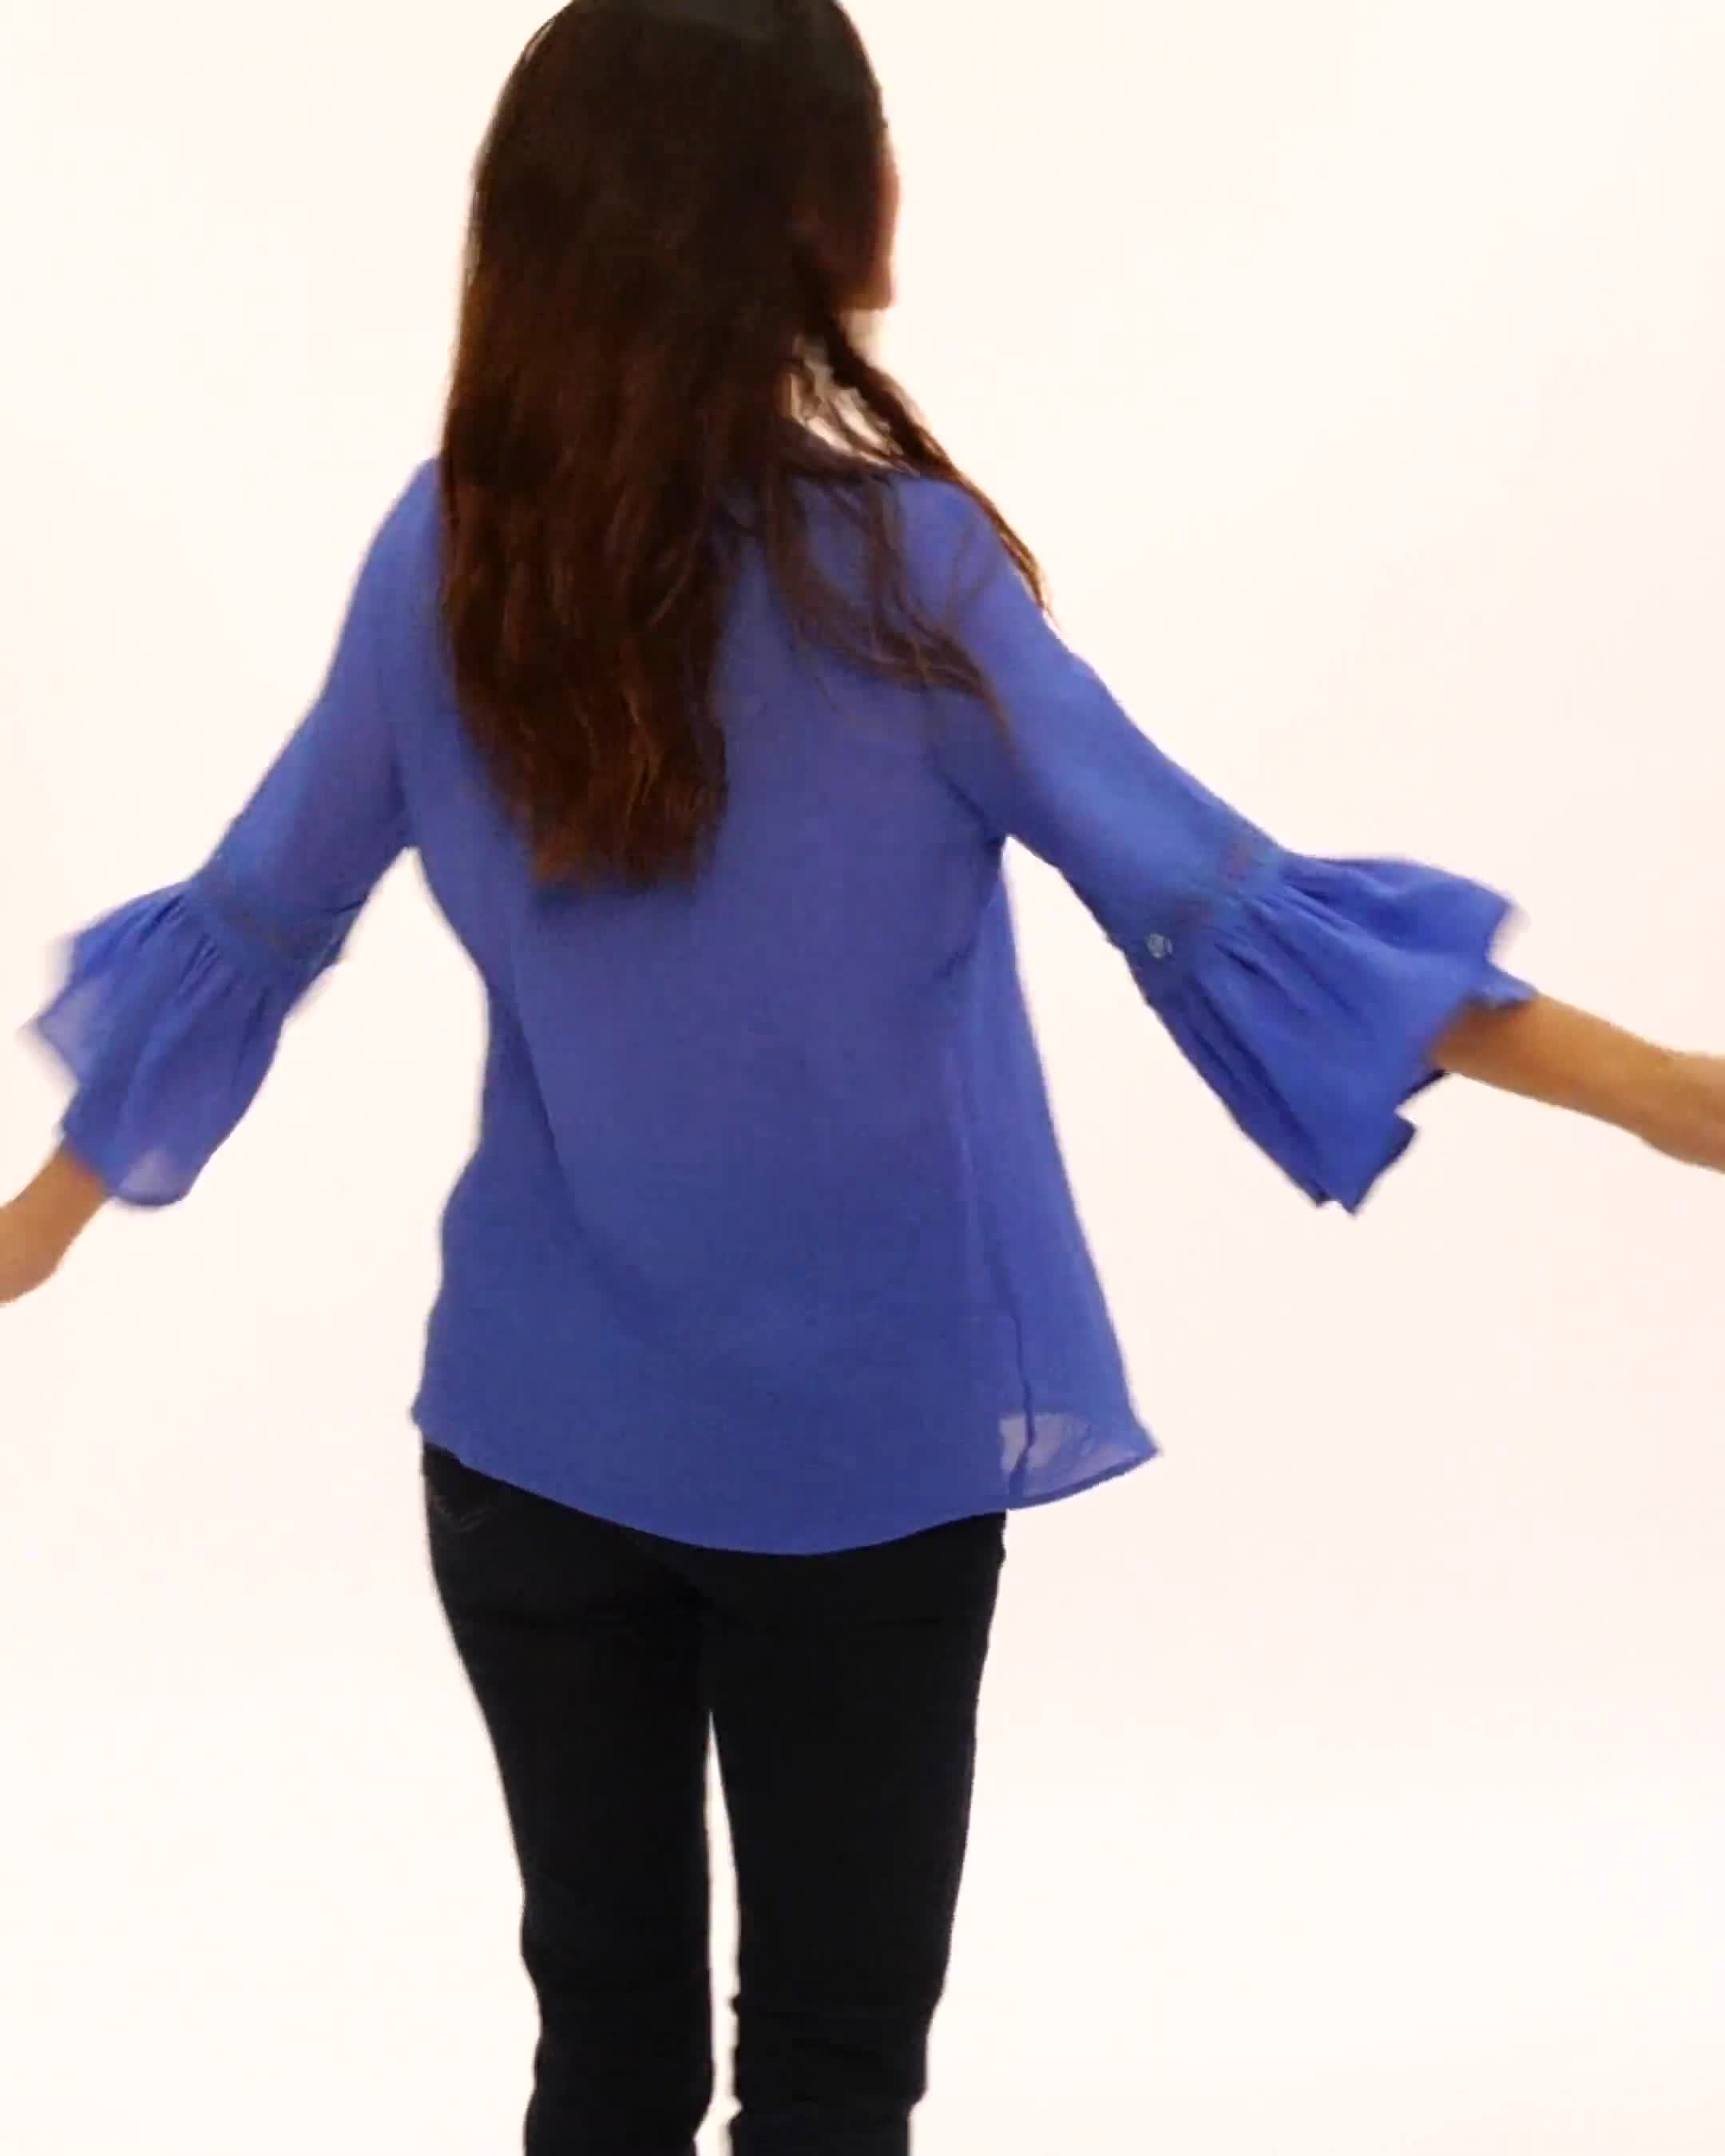 V-Neck Crochet Trim Texture Top - Video